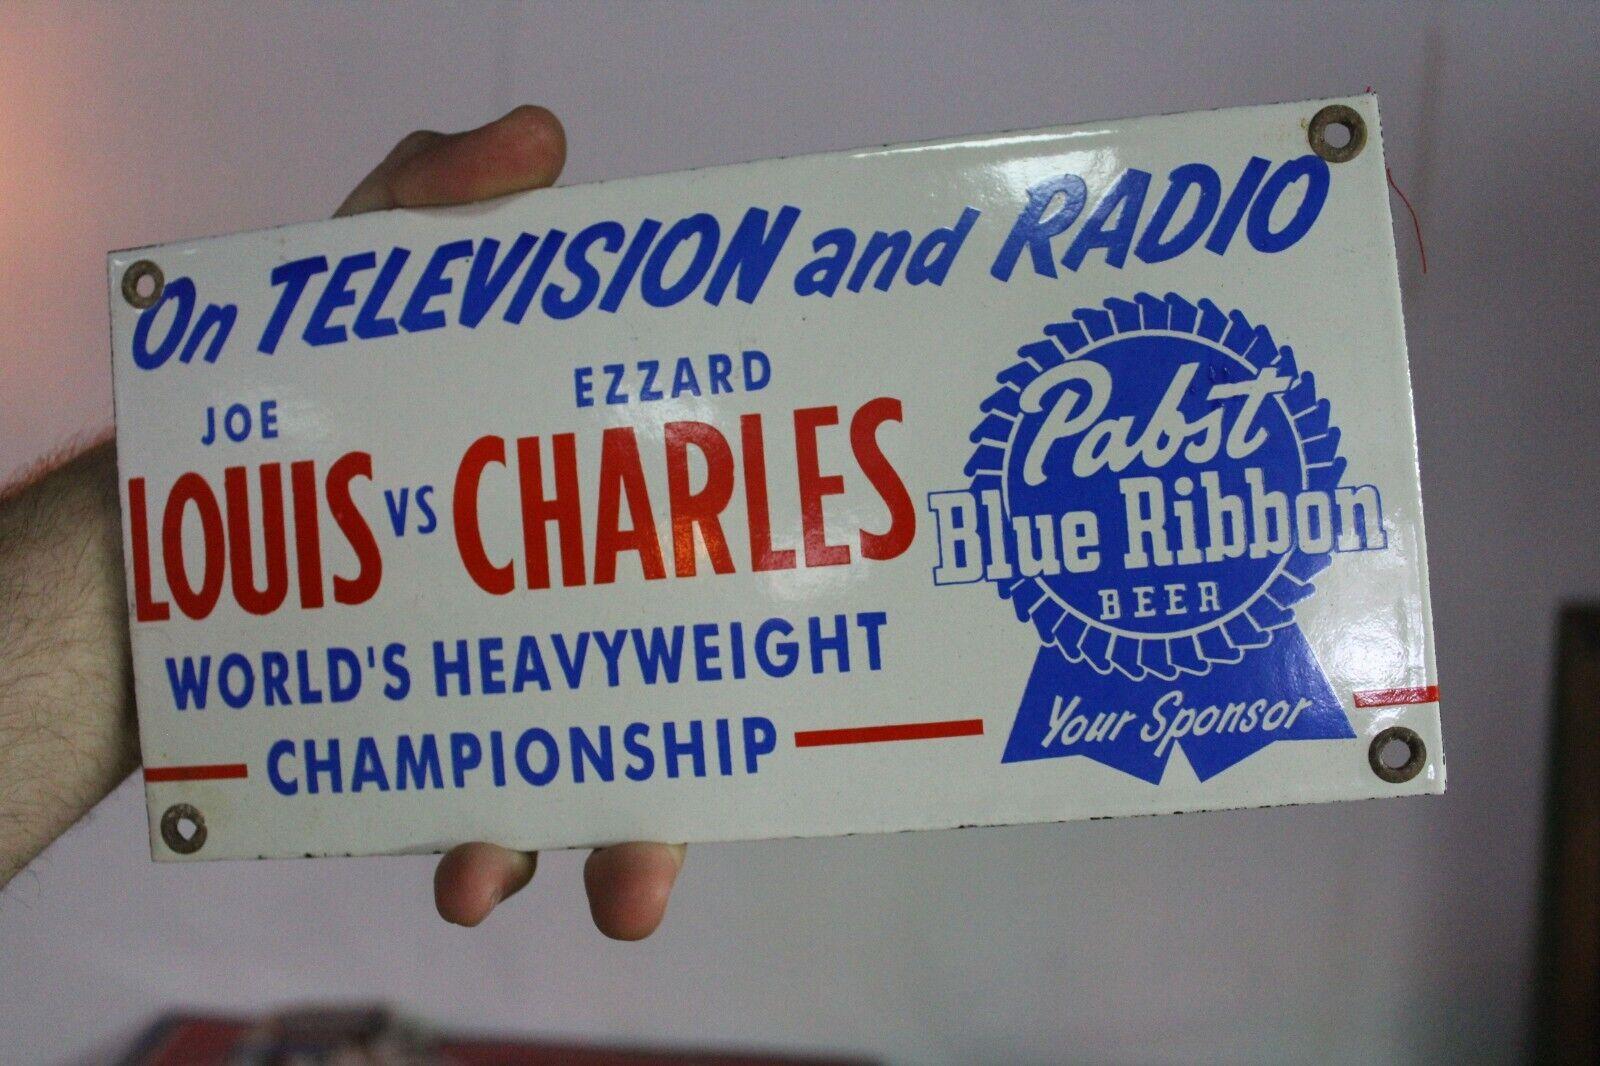 PABST BLUE RIBBON JOE LOUIS VS CHARLES HEAVYWEIGHT CHAMP PORCELAIN METAL SIGN 66 - $53.00